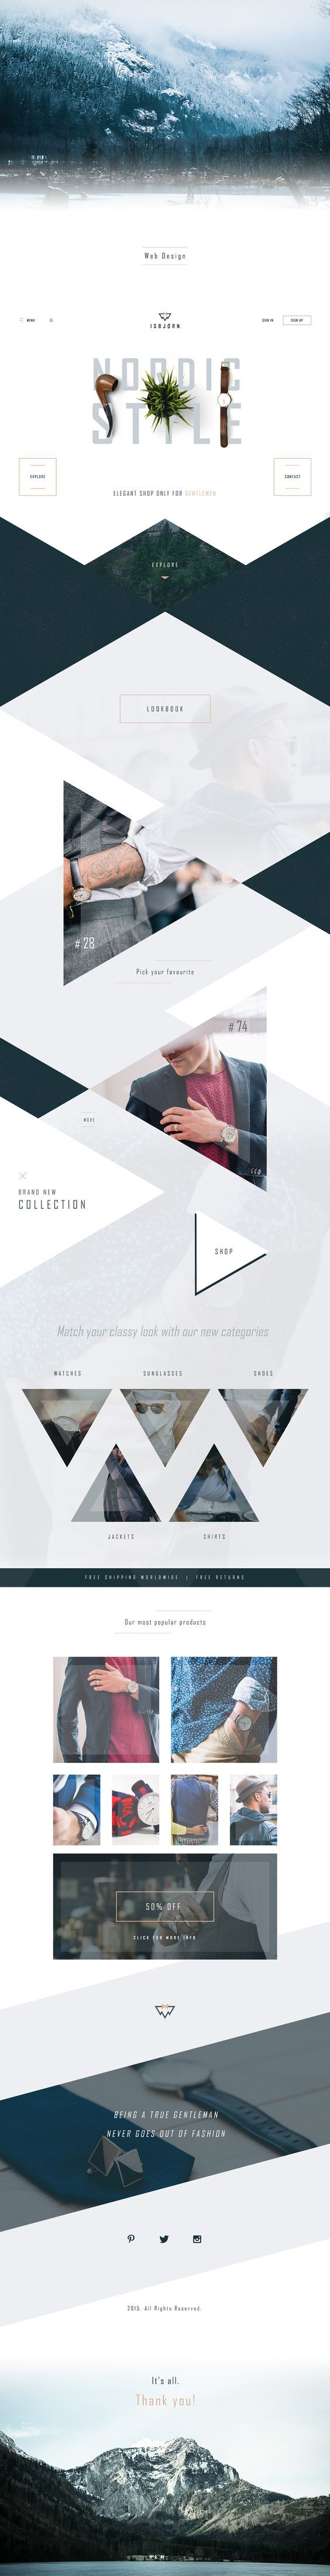 Fashion exclusive watch #webdesign #design #inspiration #layout idea